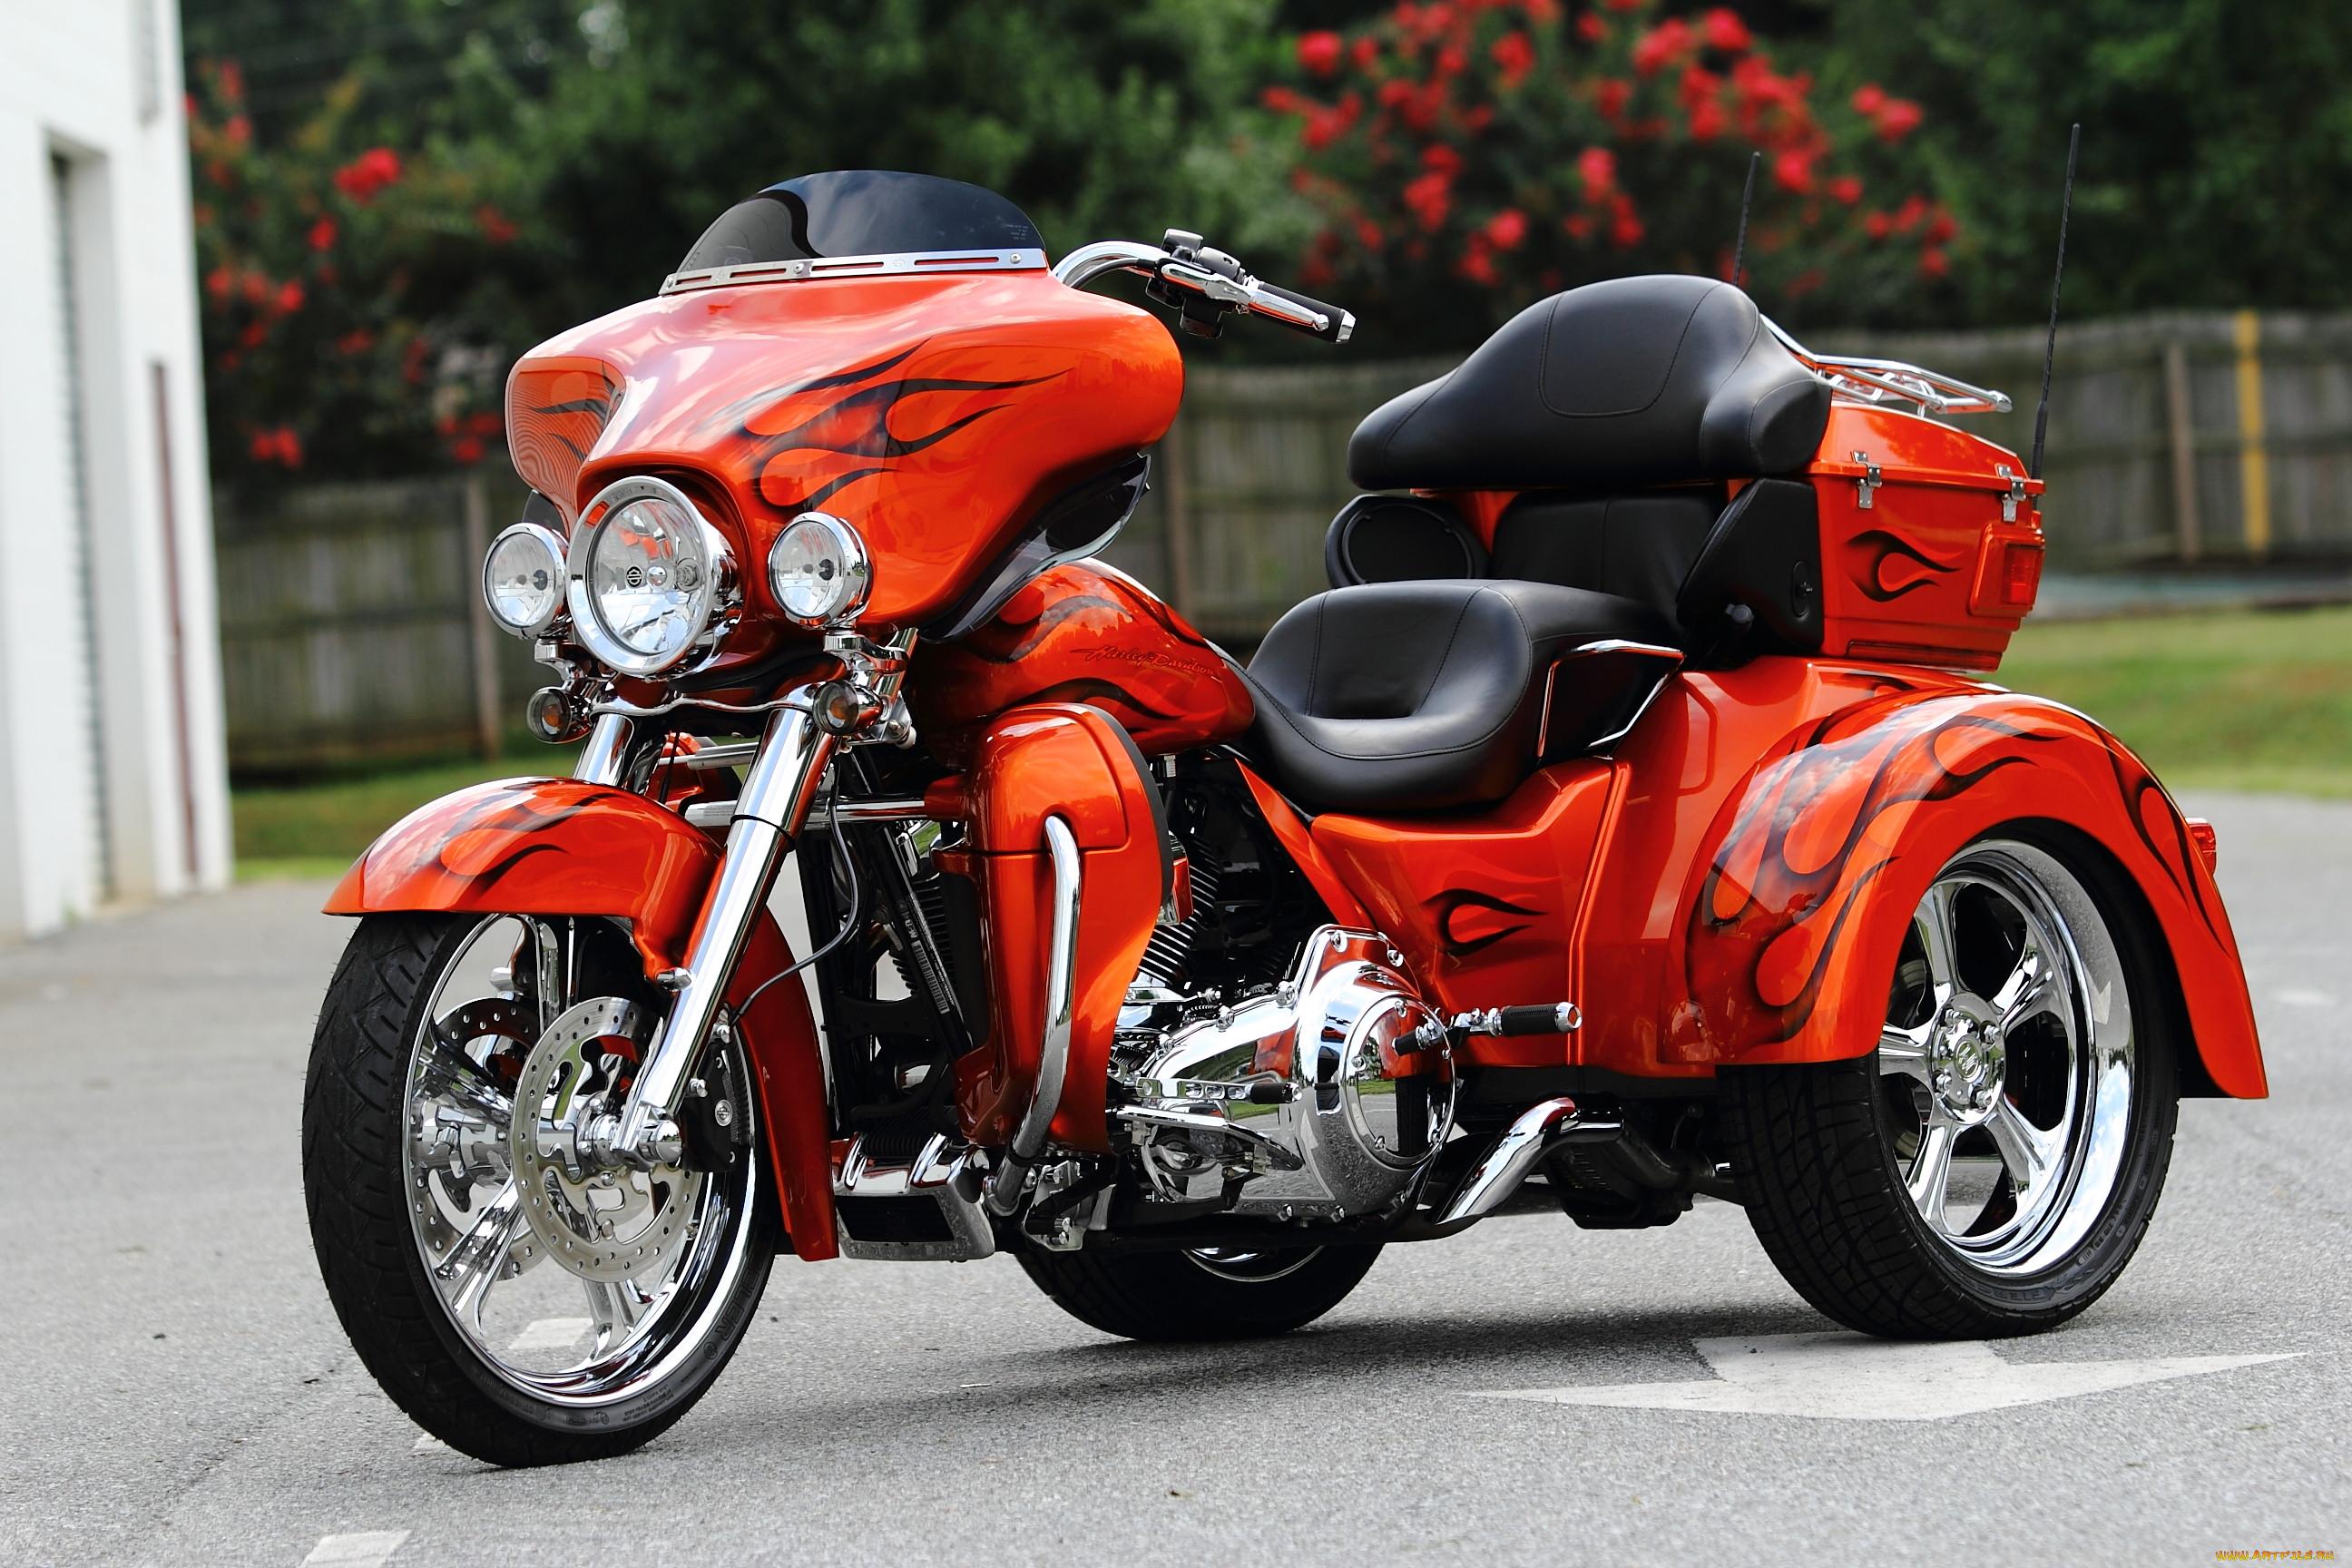 картинки байки мотоциклы фото момента появления куклы